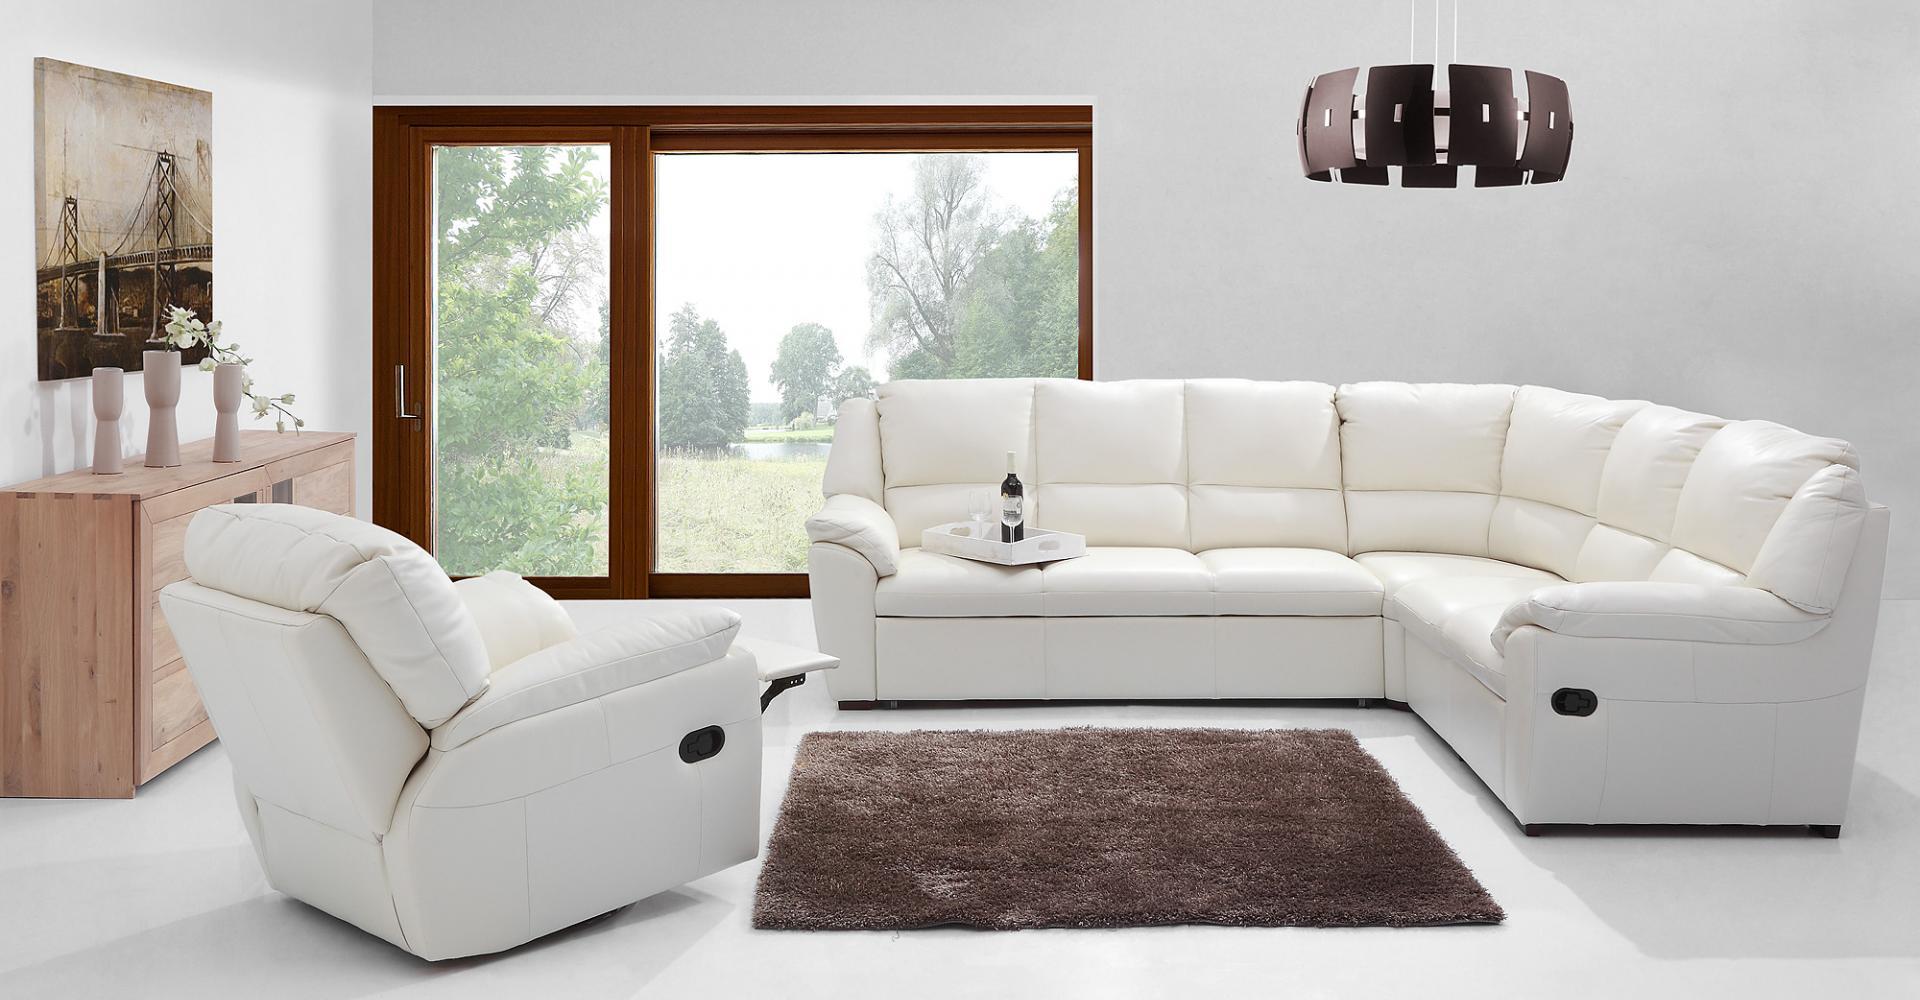 Salon meblowy Mebest Poznan, meble Caya Design naroznik York